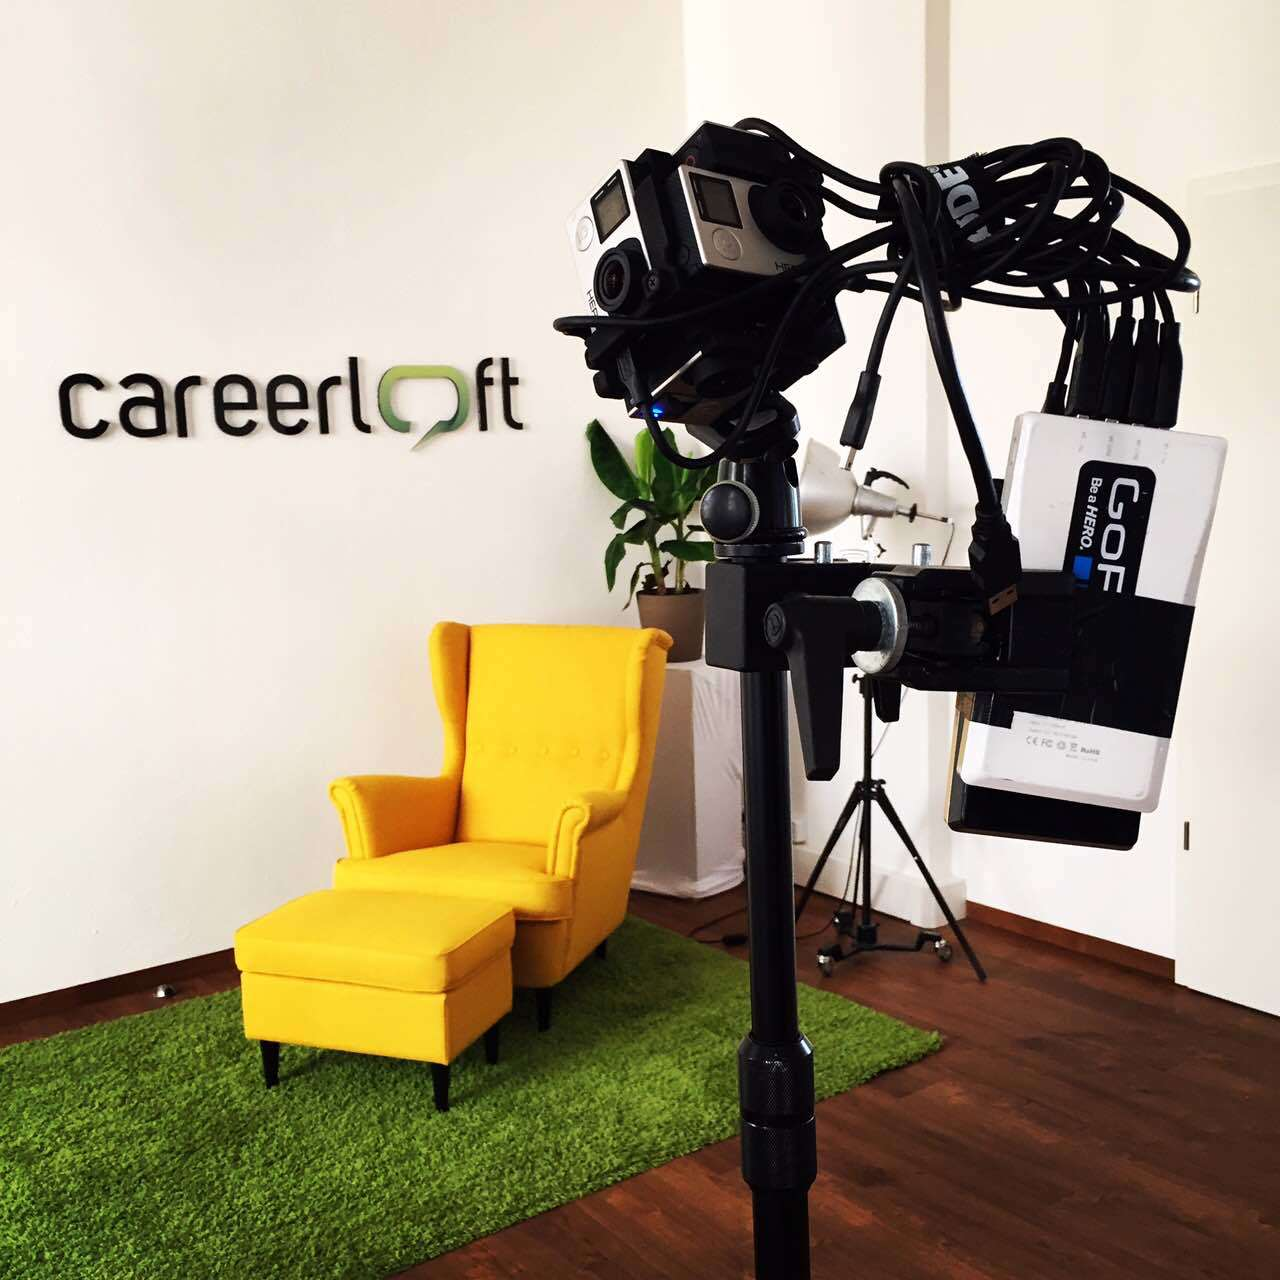 VR mit careerloft